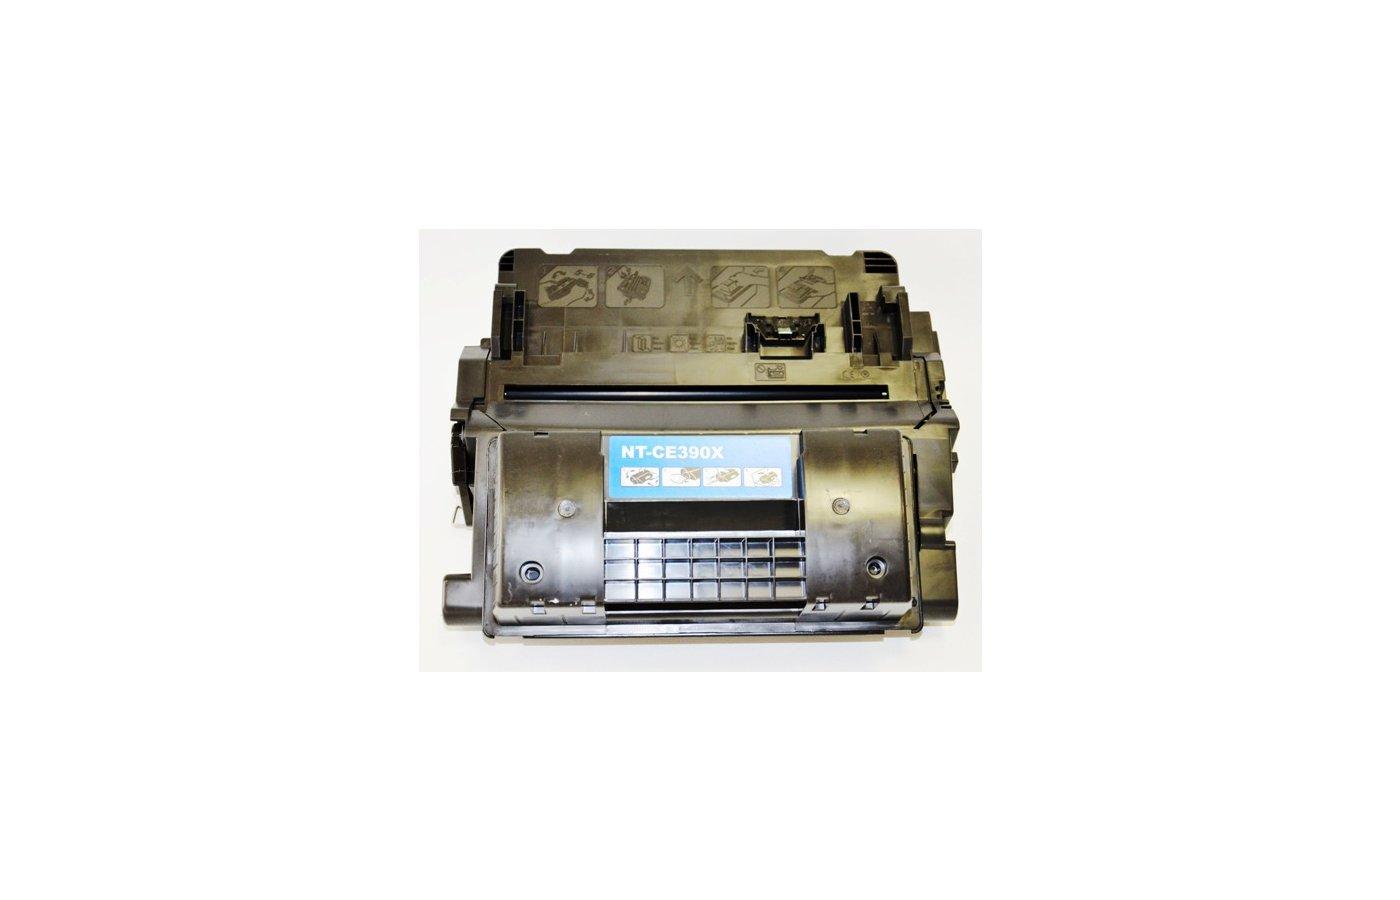 Картридж лазерный GG NT-CE390X Совместимый для HP LaserJet EGG NTerprise 600 M602/603 M4555MFP (24000стр)